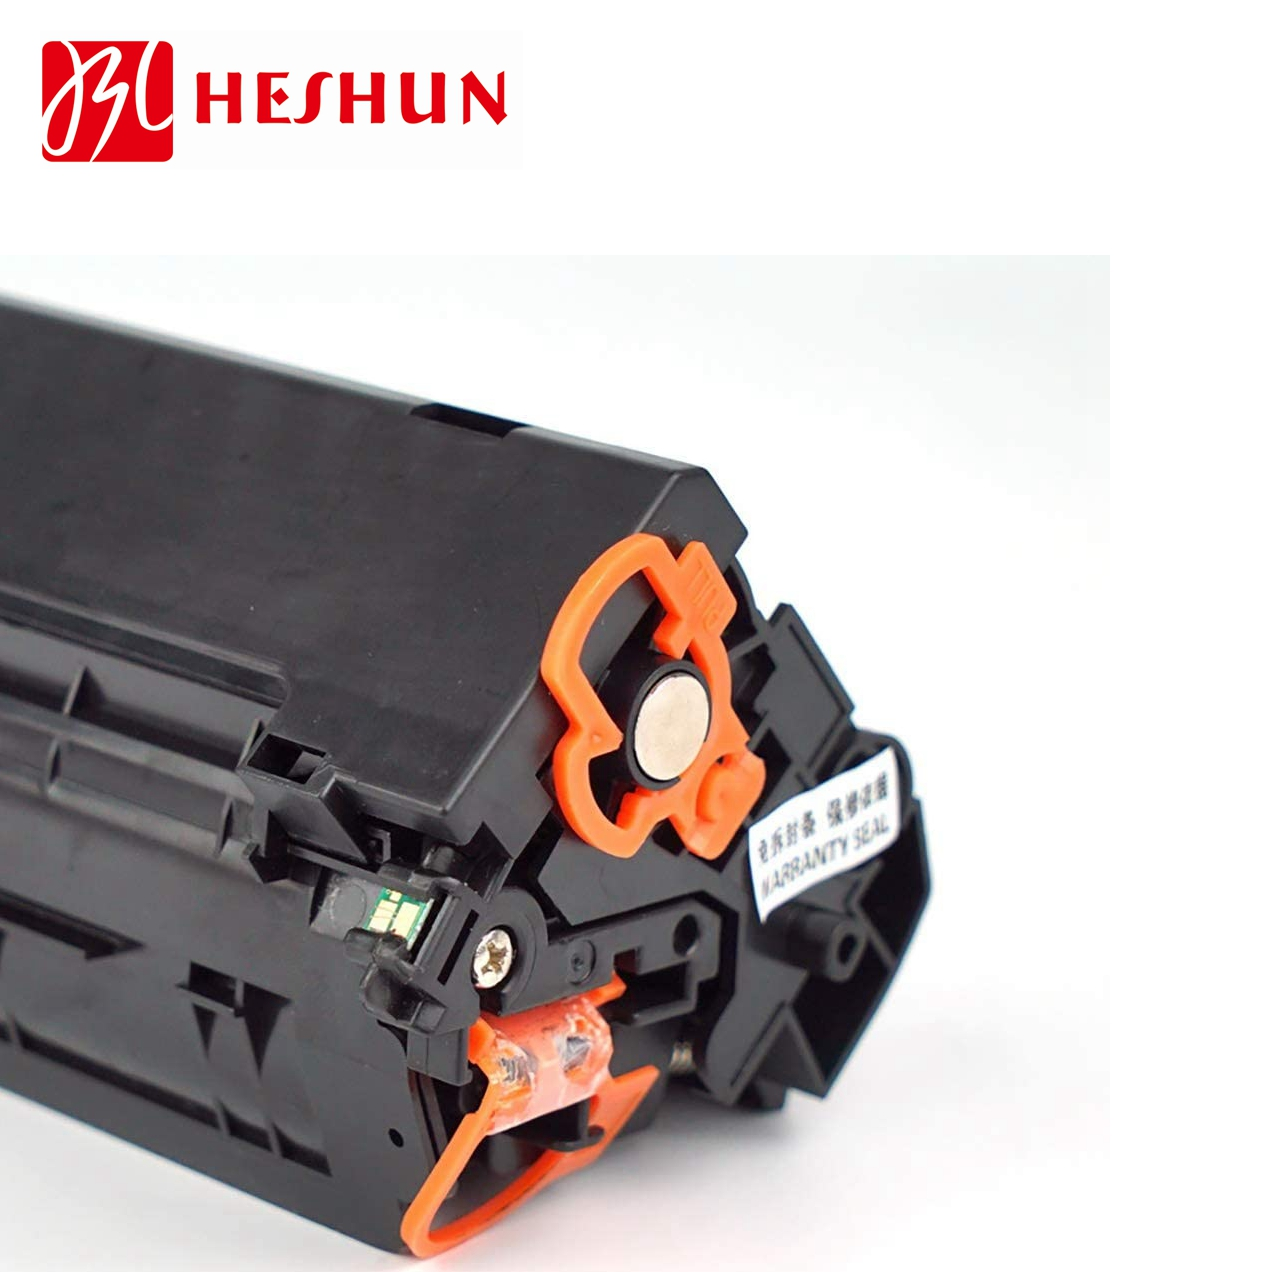 HESHUN CF244A 레이저 토너 카트리지 프린터 레이저젯 프로 M15/M16/MFP28